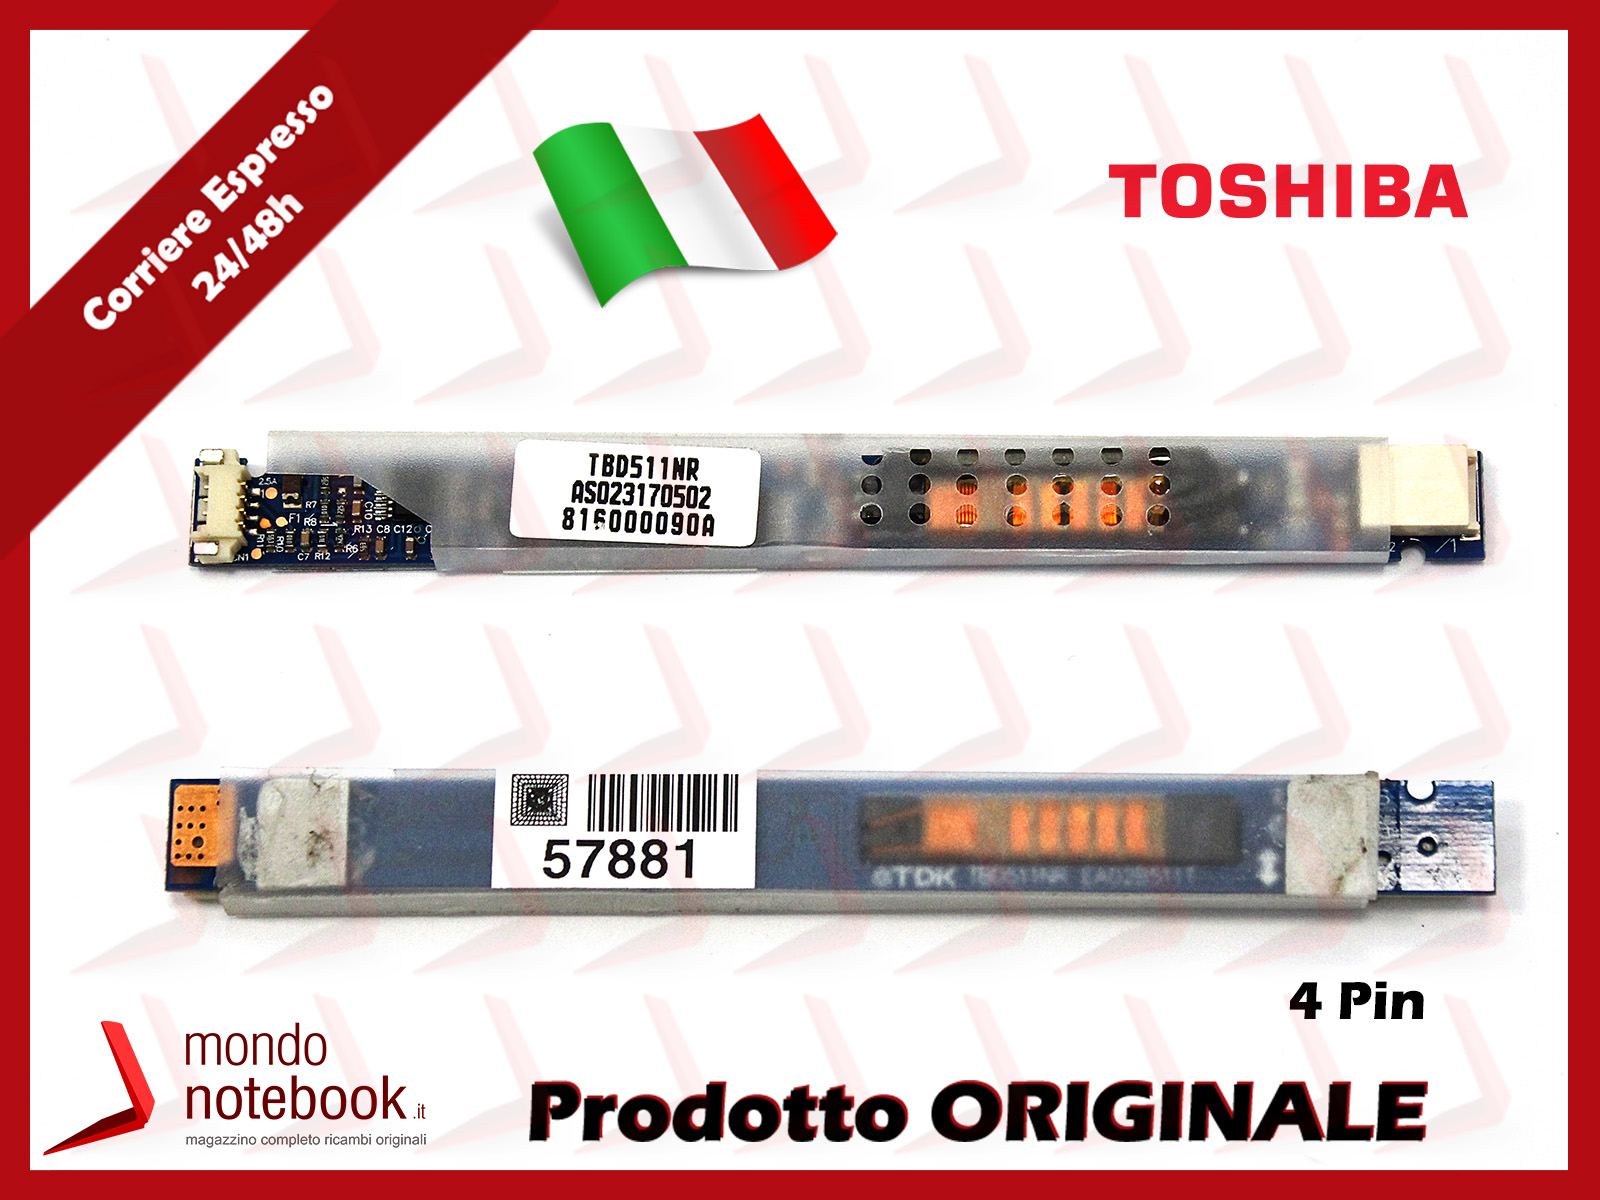 https://www.mondonotebook.it/9479/inverter-board-lcd-toshiba-satellite-pro-a300d-4-pin.jpg